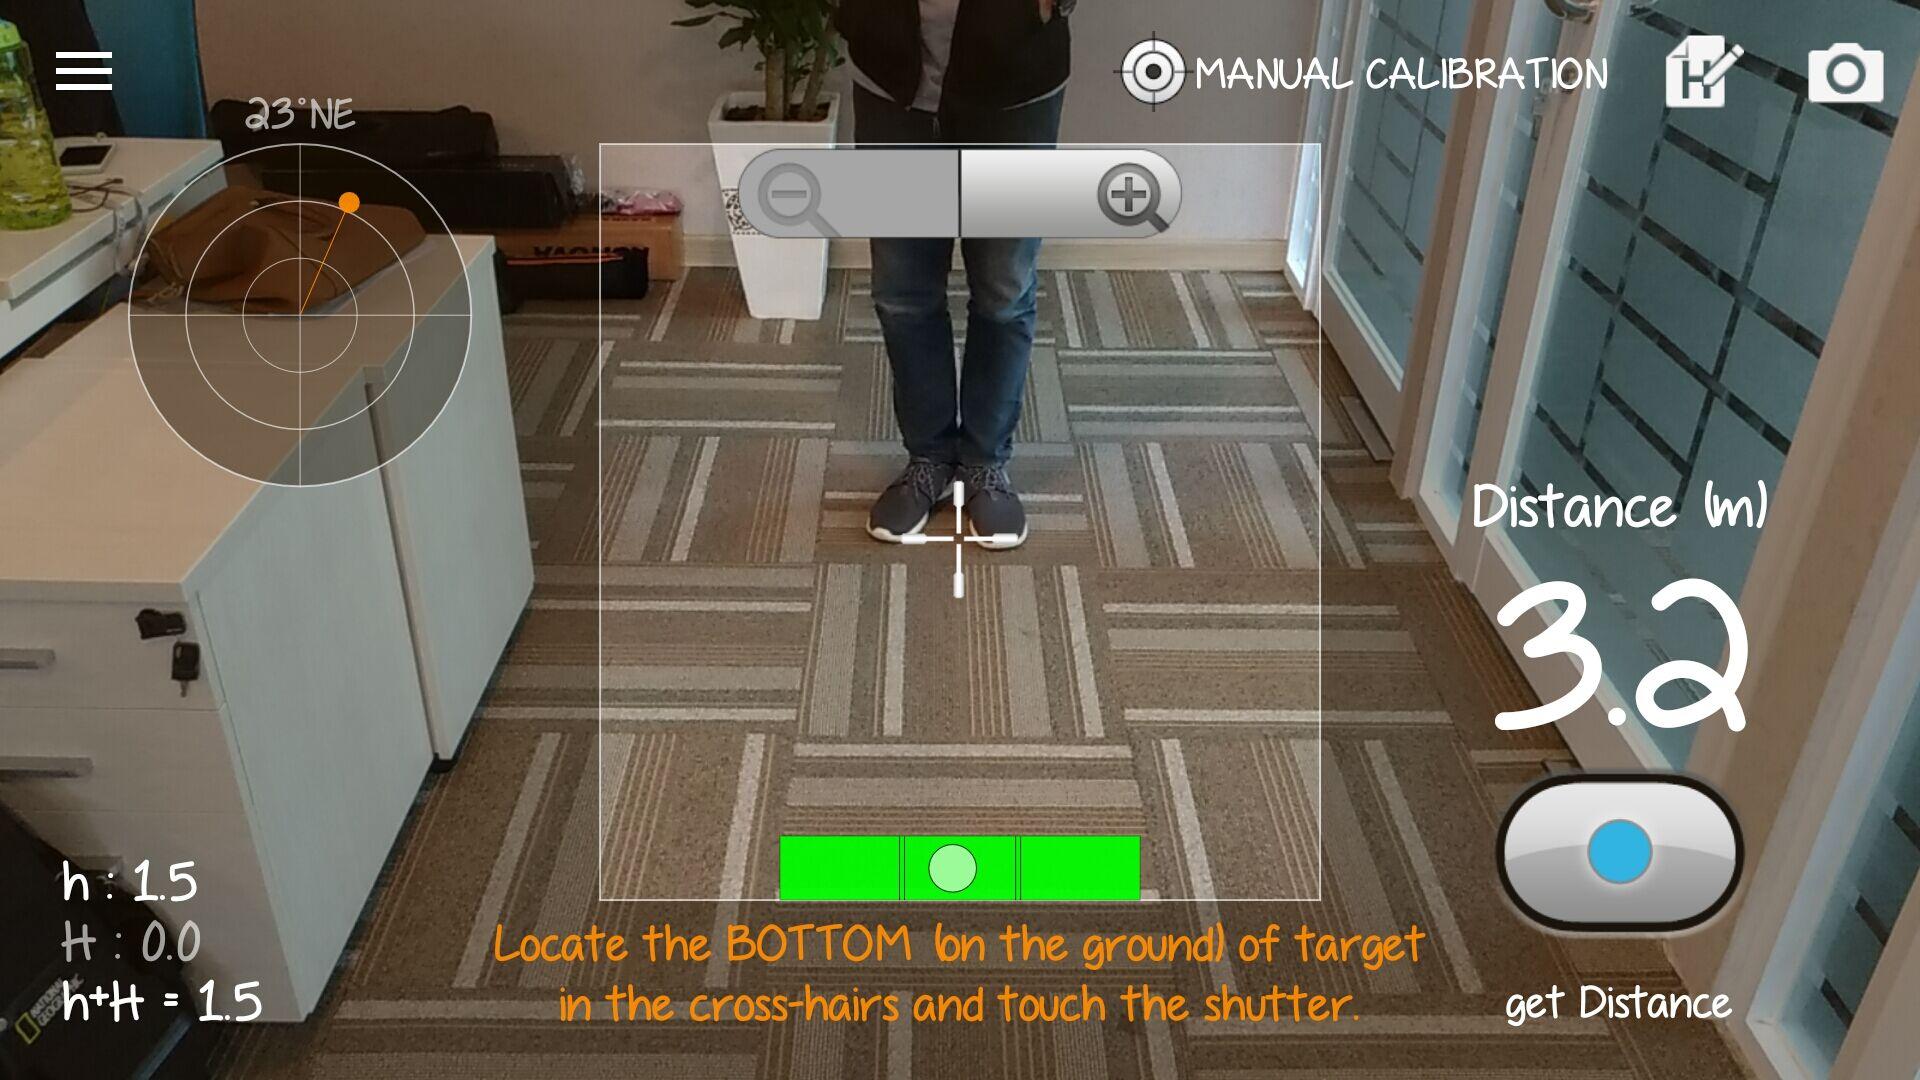 Cara Menguku Tinggi Badan Dengan Smartphone 2